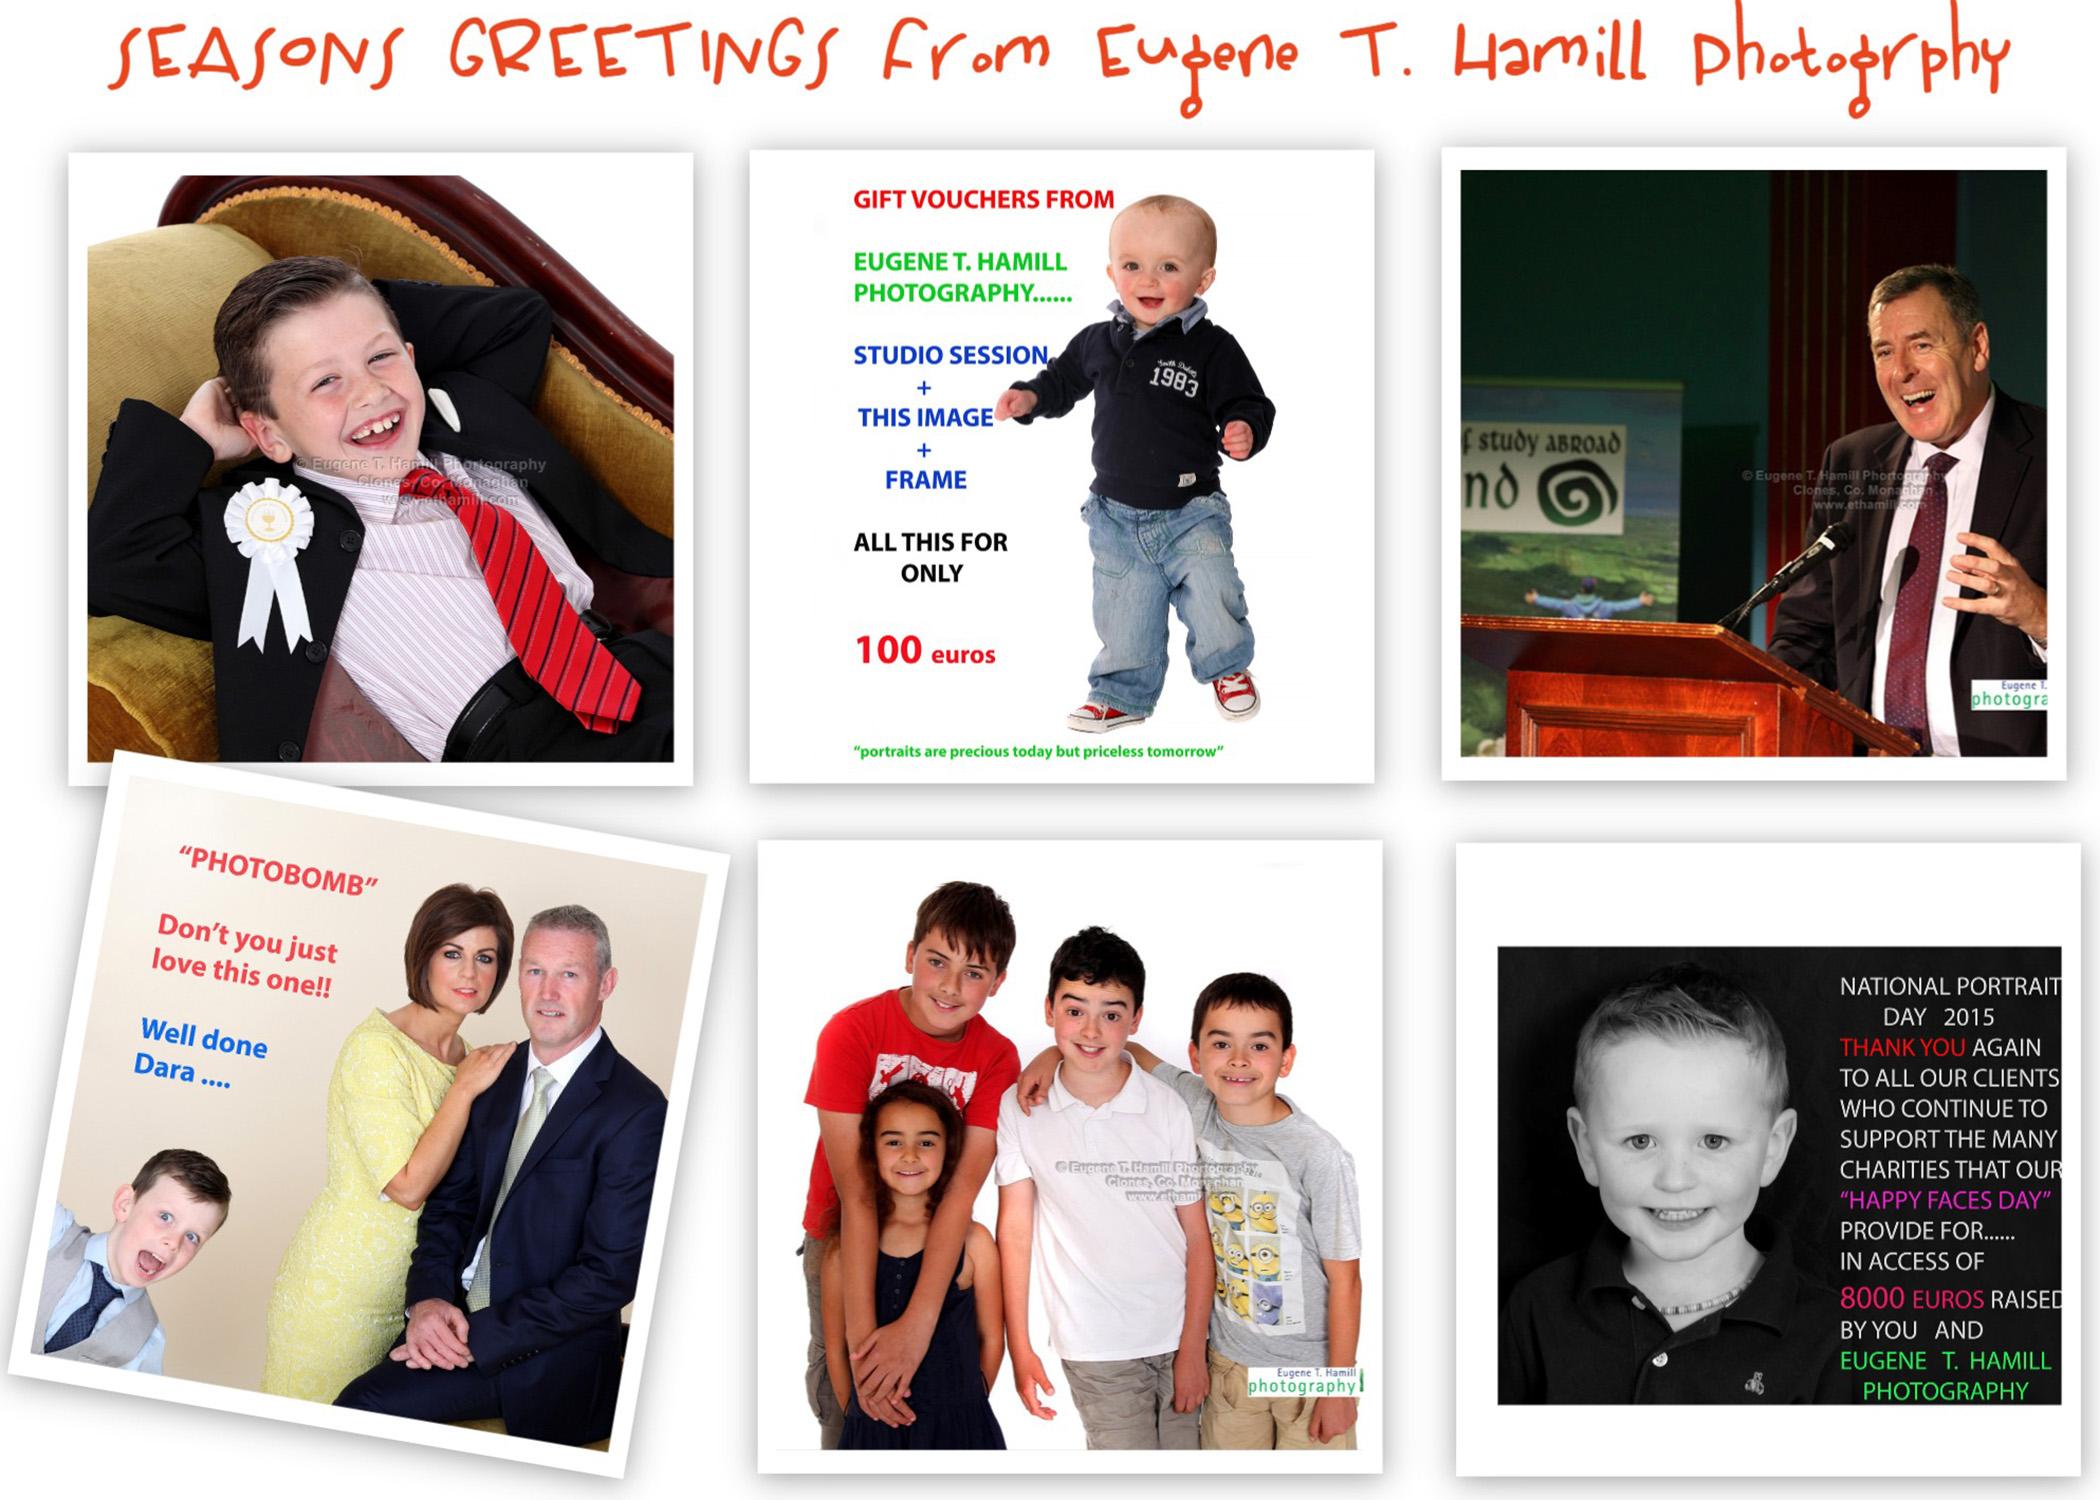 photovisi-download.jpg 7x5.jpg